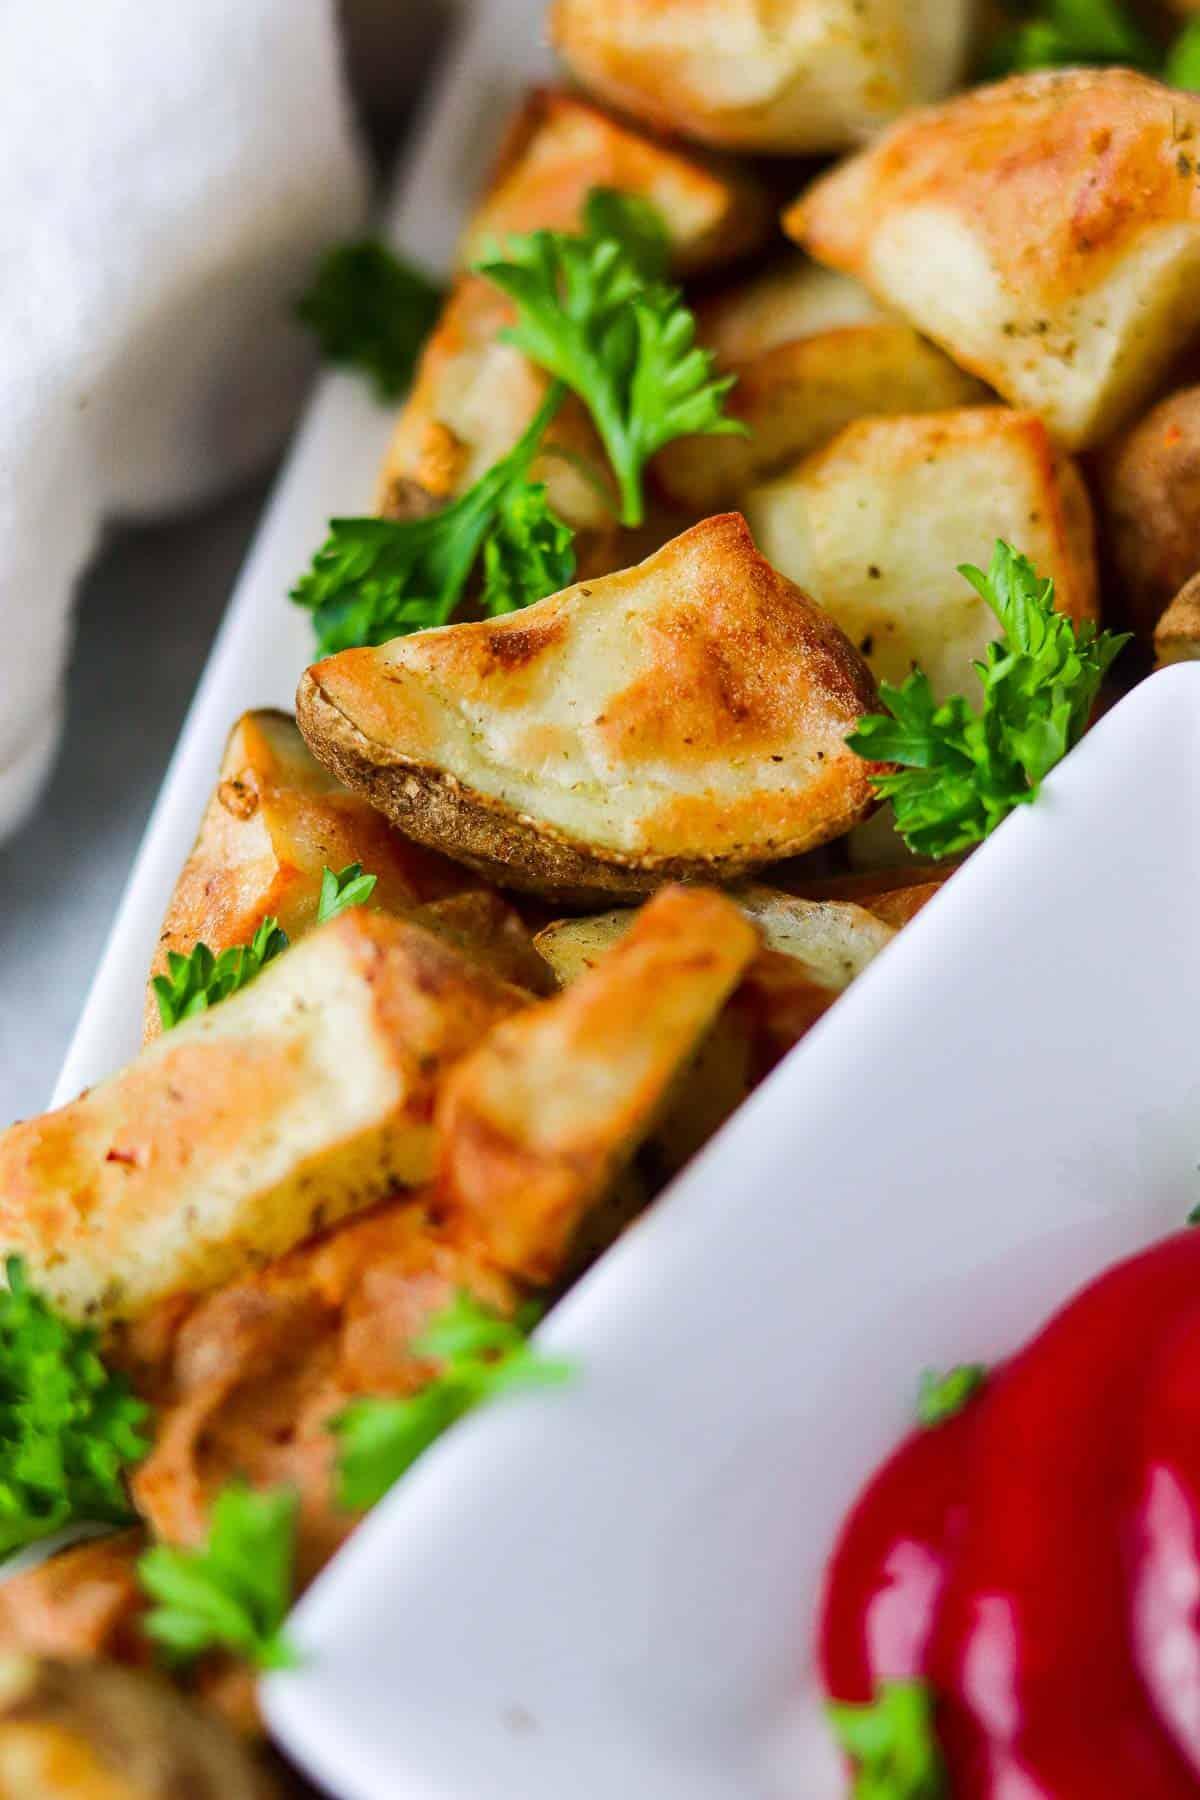 Up close air fryer potatoes on a white platter.